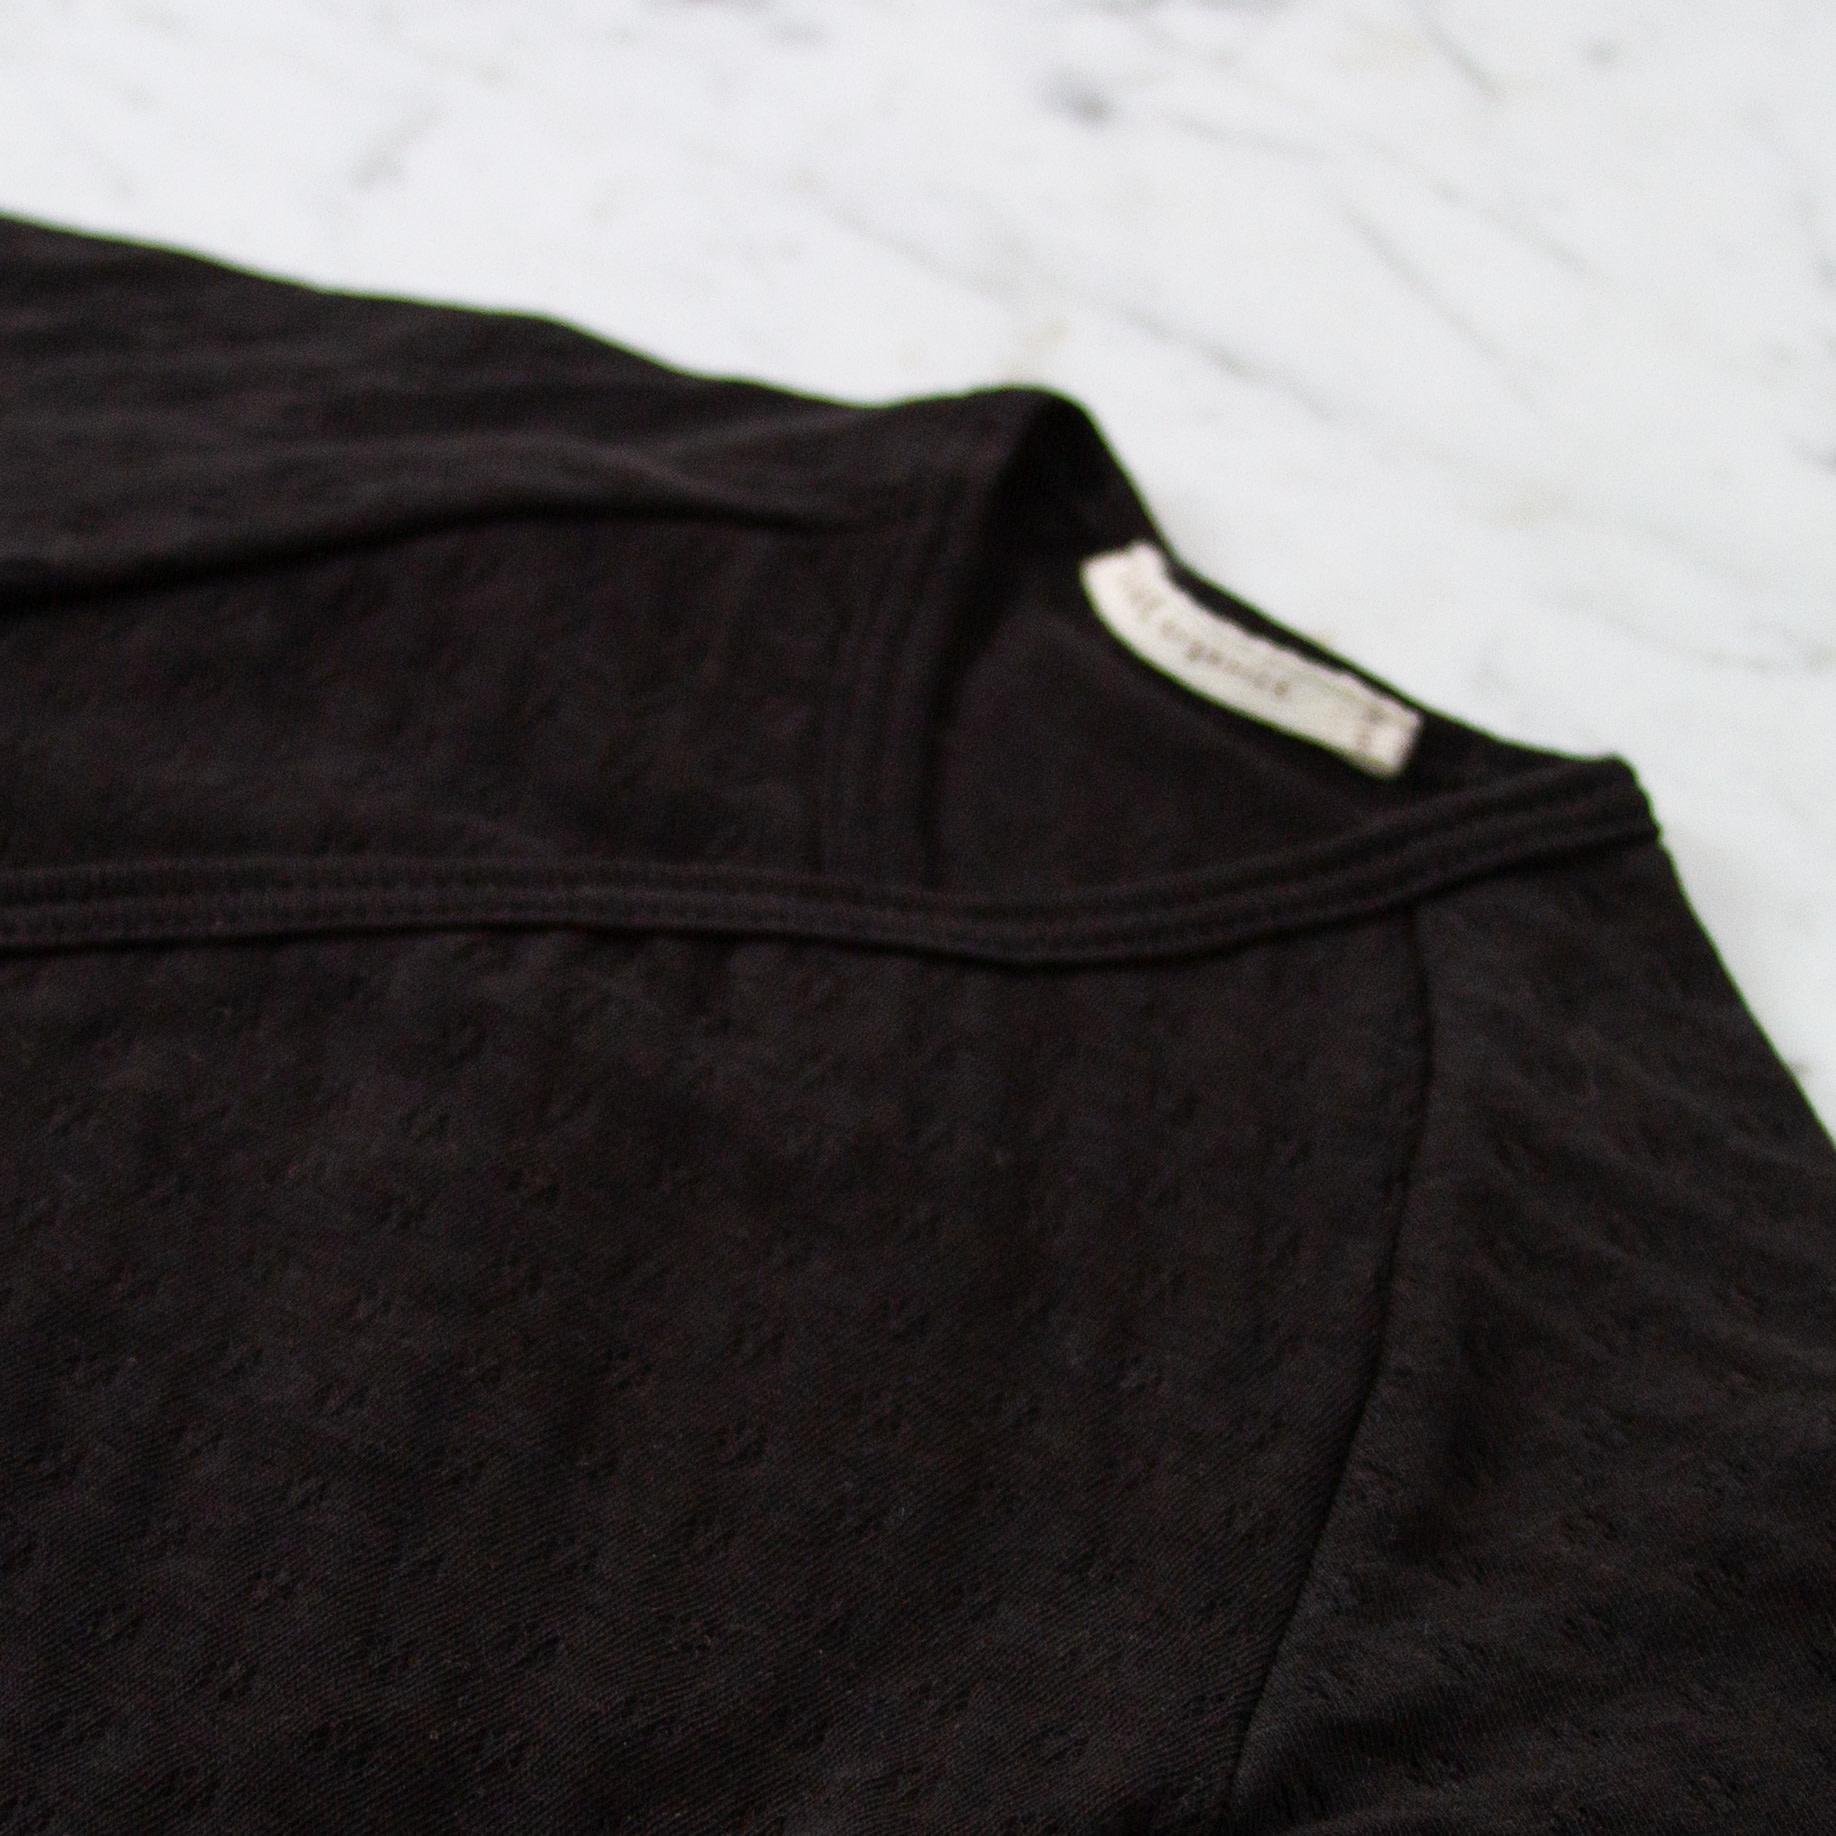 Tane Organics Kimono Onesie with Leggings - Earth - 3-6 Month